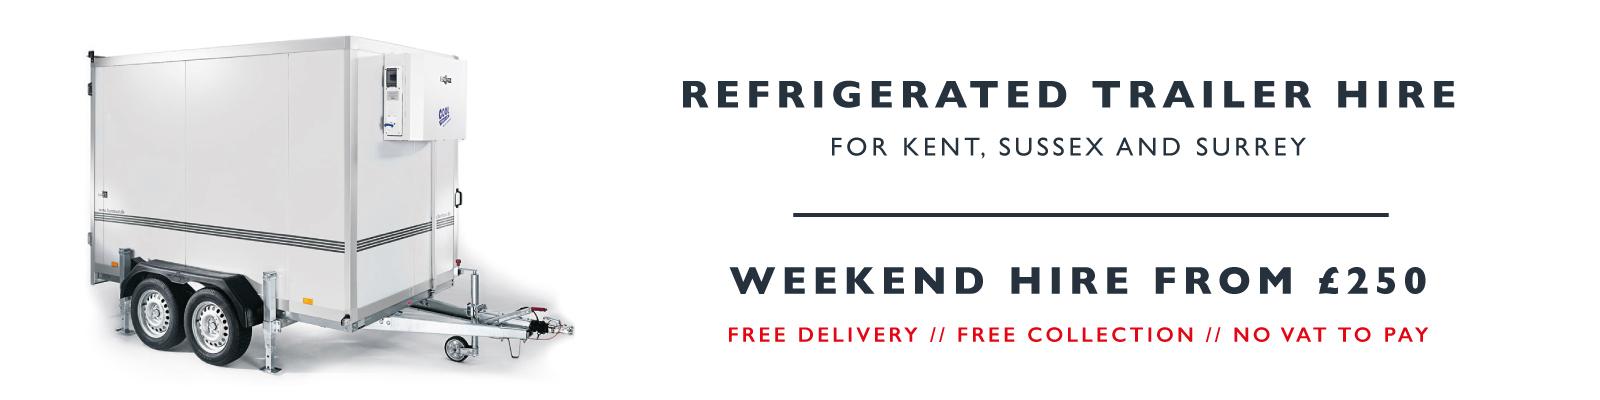 Refrigerated-Trailer-Hire-Kent,-Sussex,-Surrey-(£250)